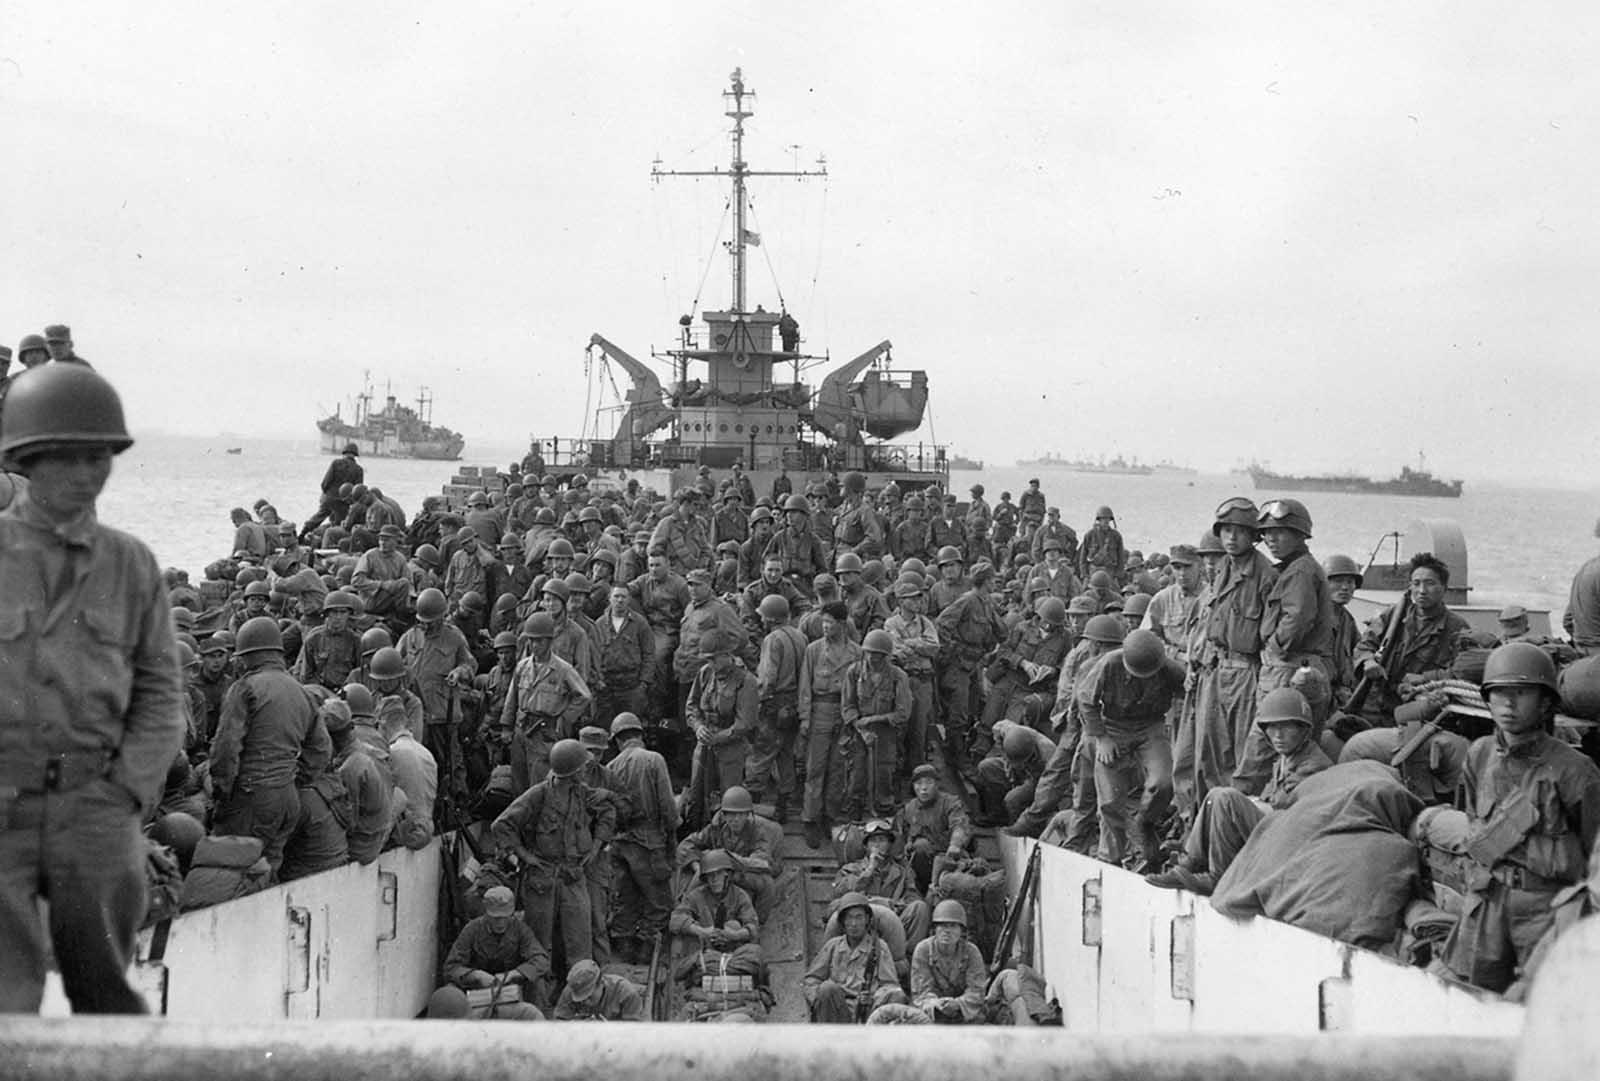 31st Infantry Regiment at Inchon Harbor 9-18-50.jpg